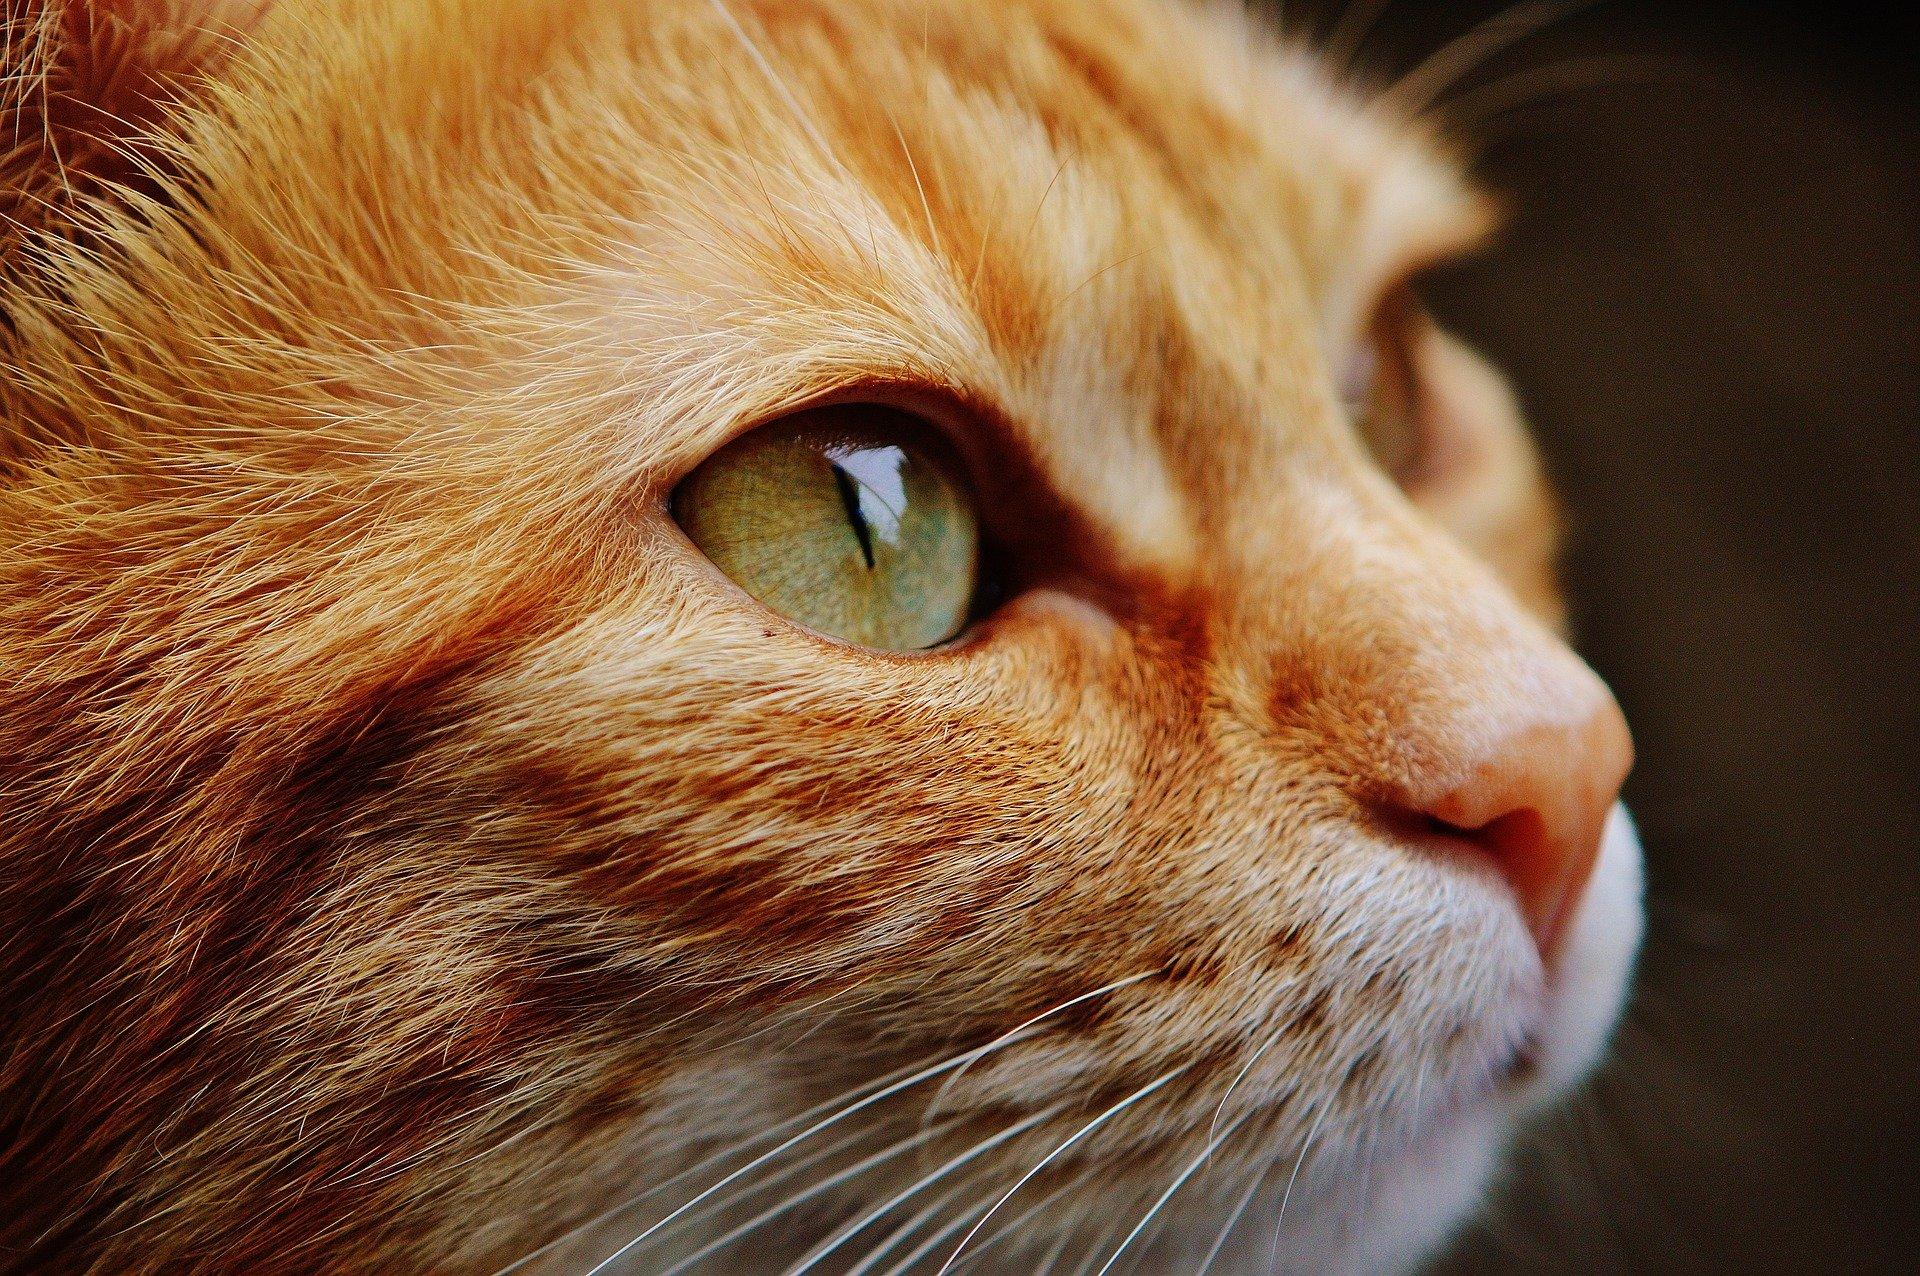 gatos-contagio-coronavirus-estados-unidos